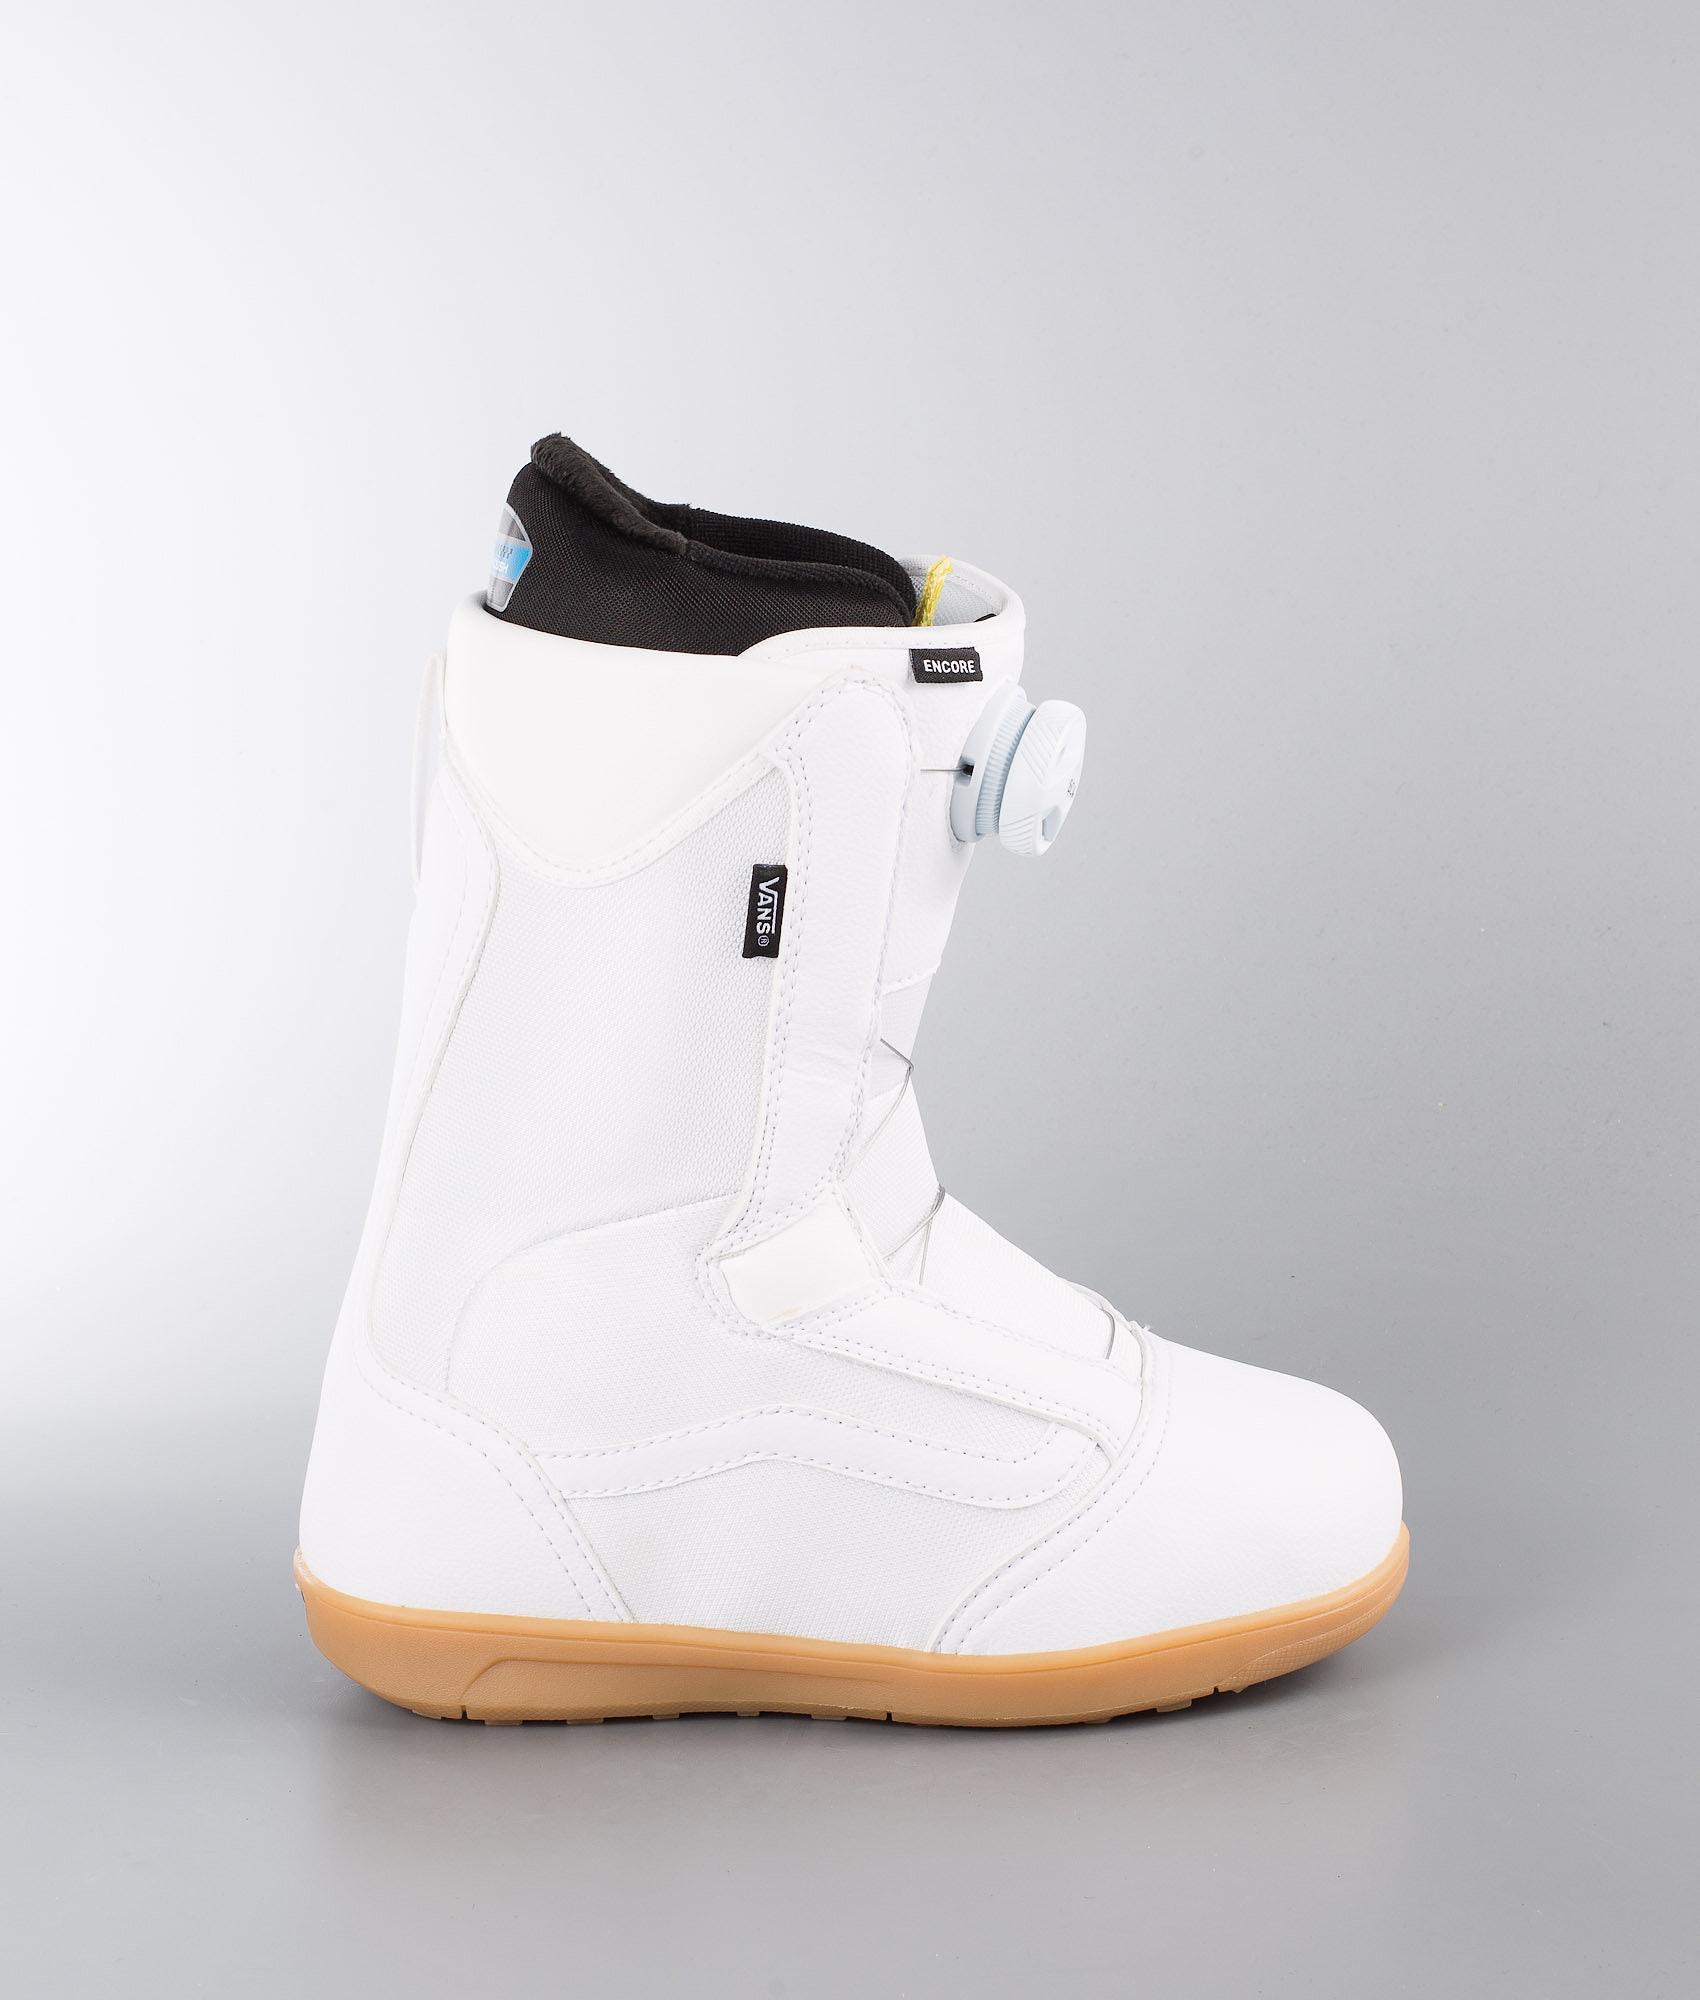 0725a01ae4 Vans Encore W Snowboard Boots White Gum - Ridestore.com